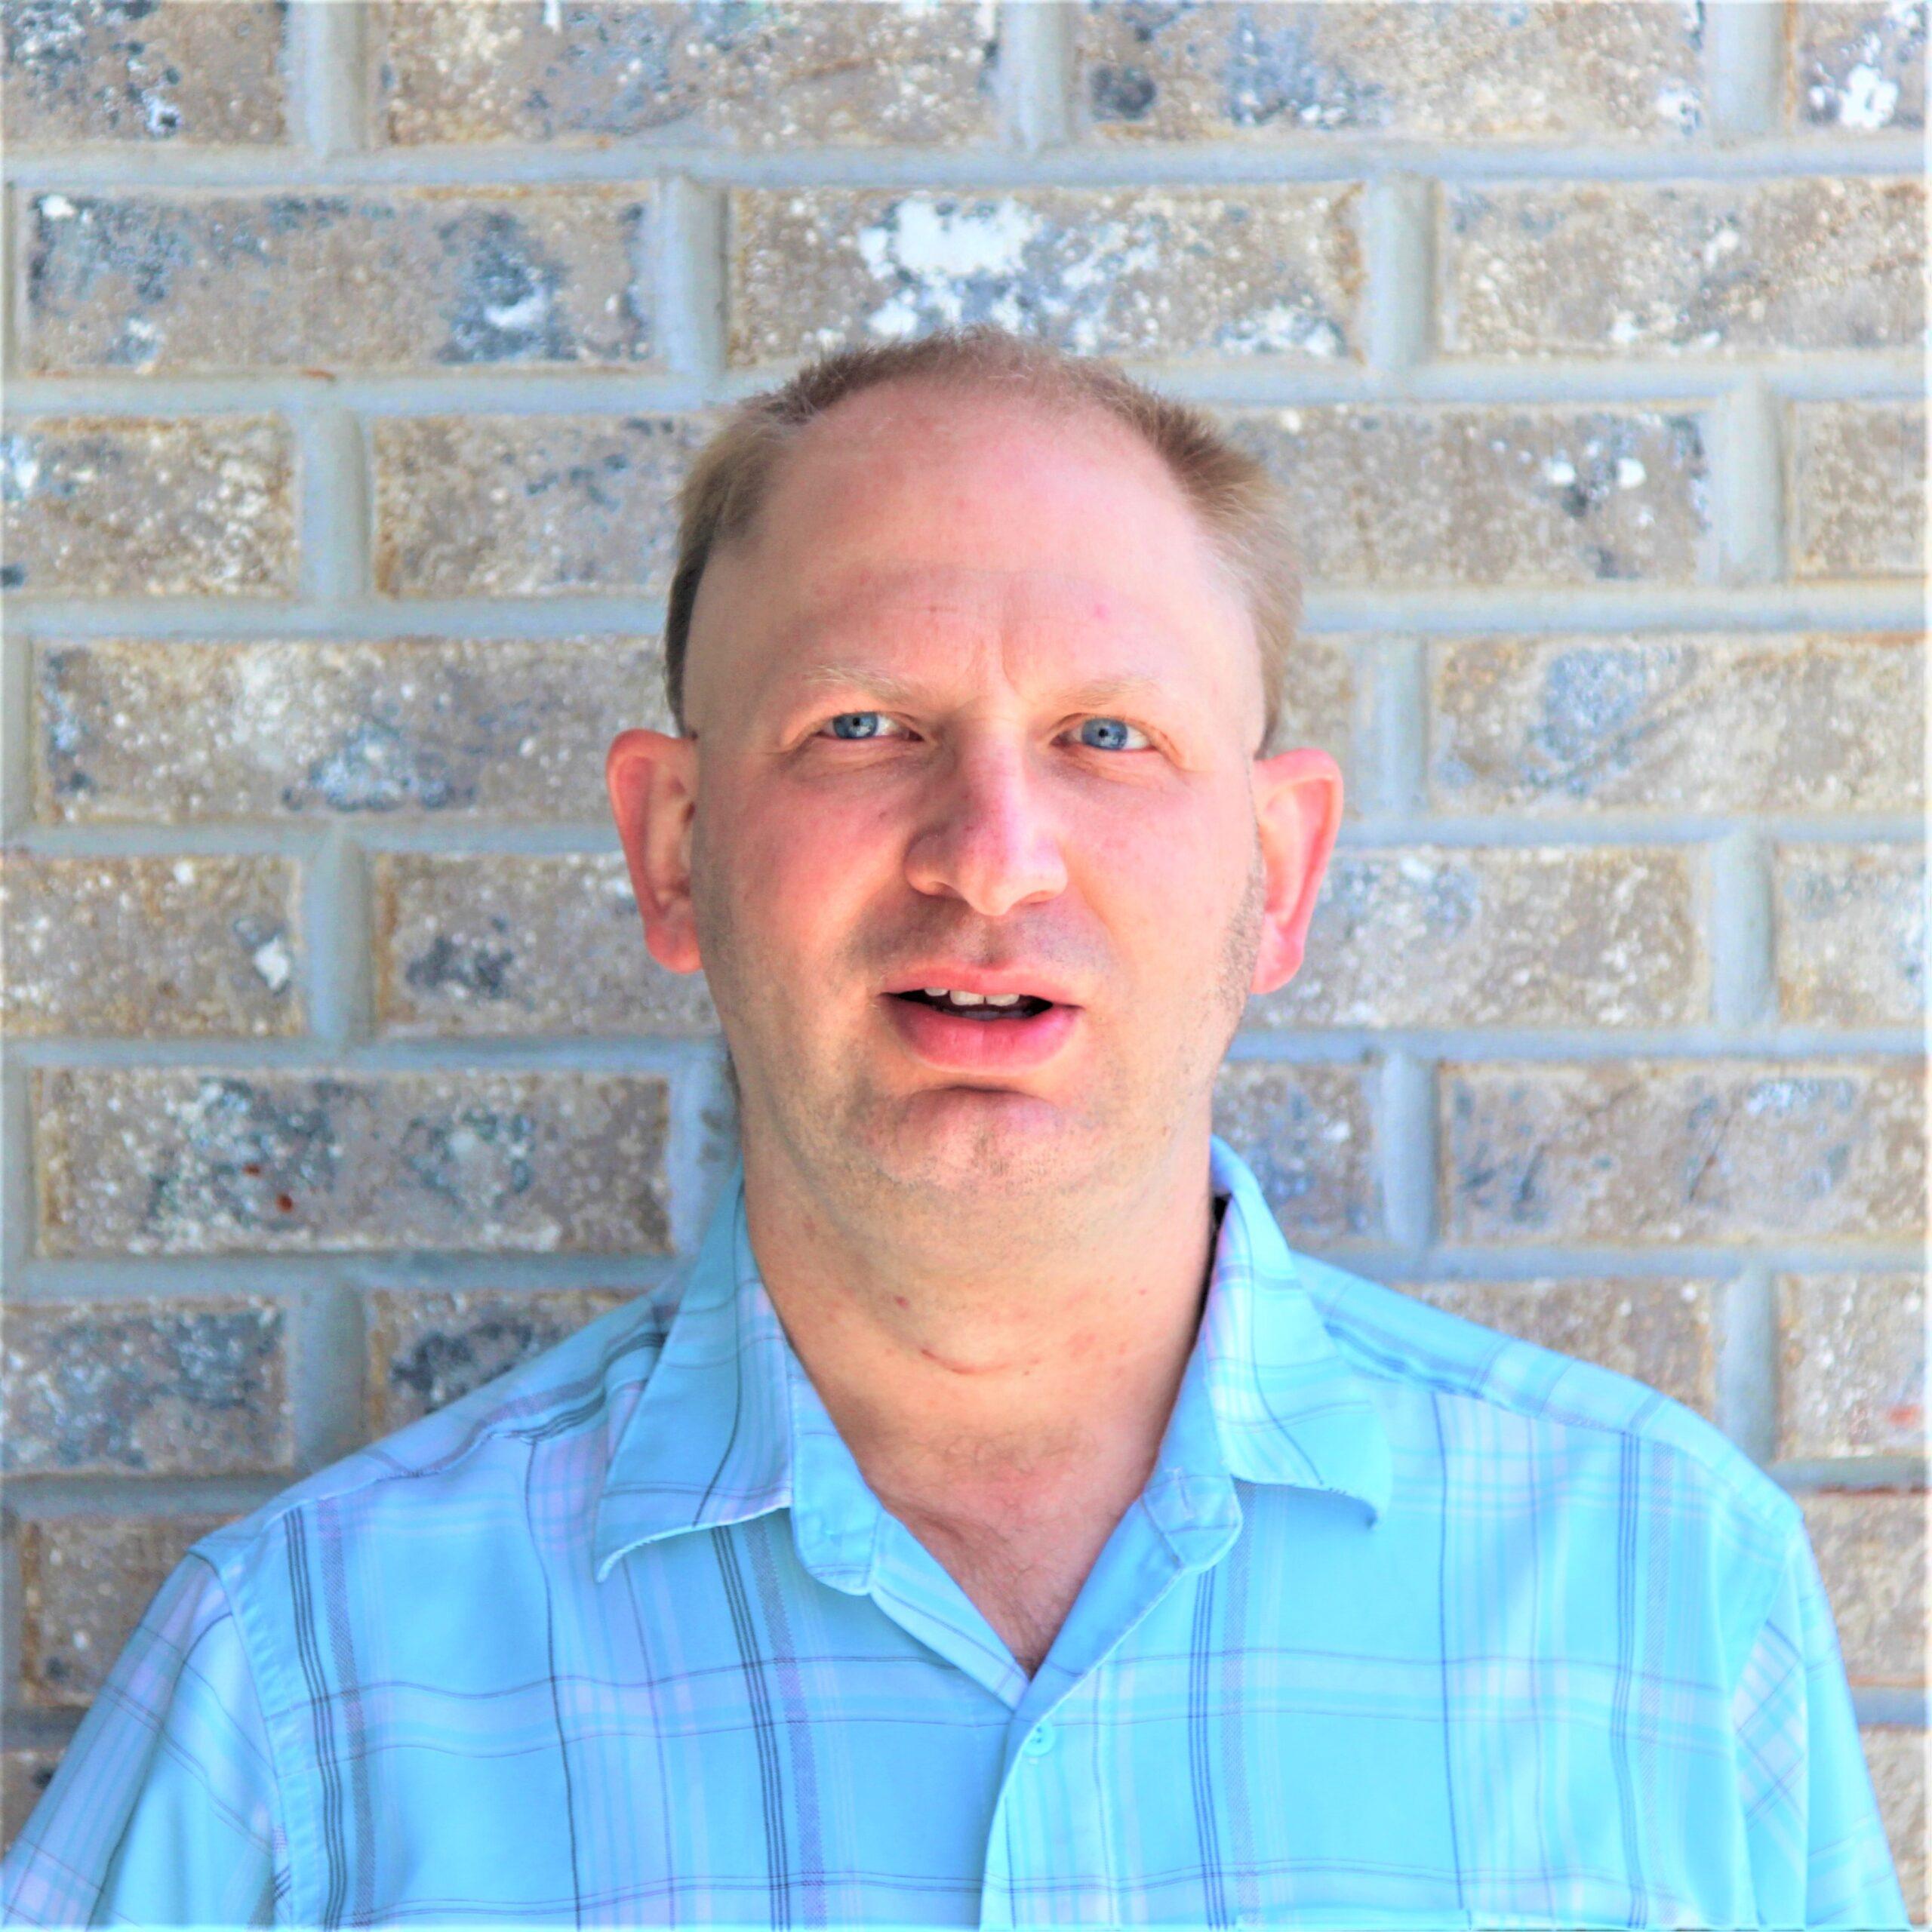 Derek Bjelland